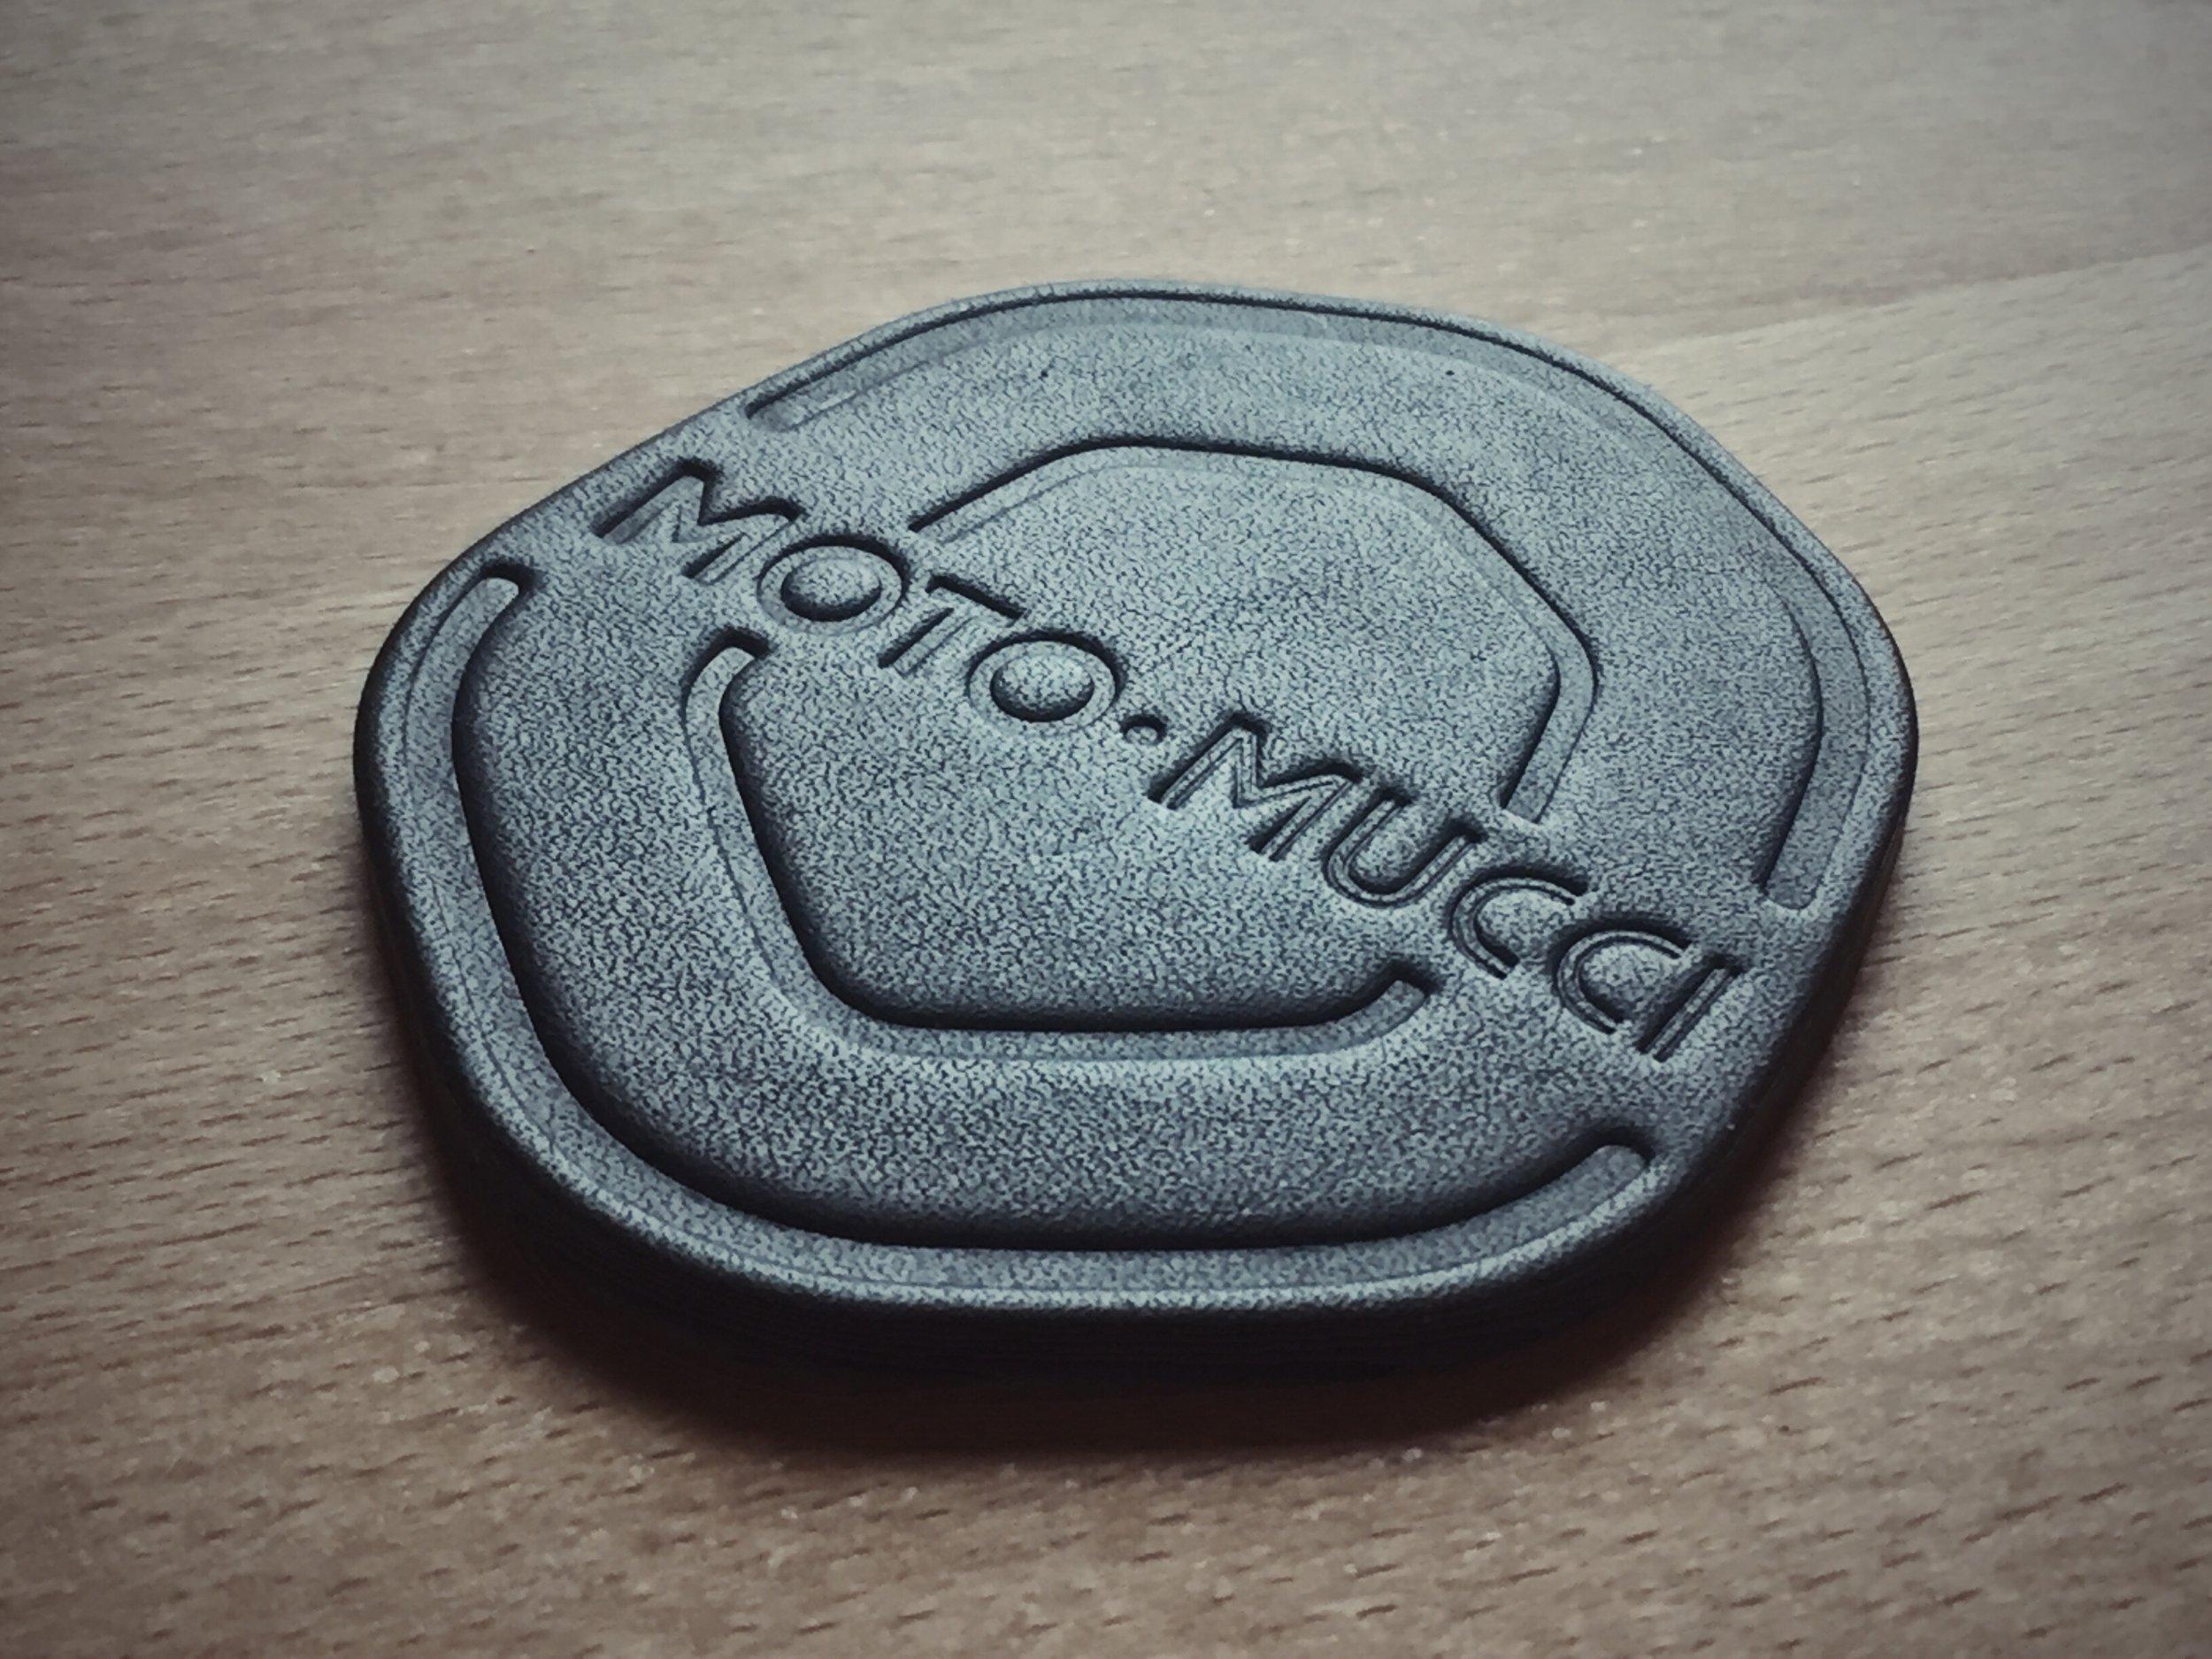 Moto-Mucci_Custom_Leather_Tags (3).JPG